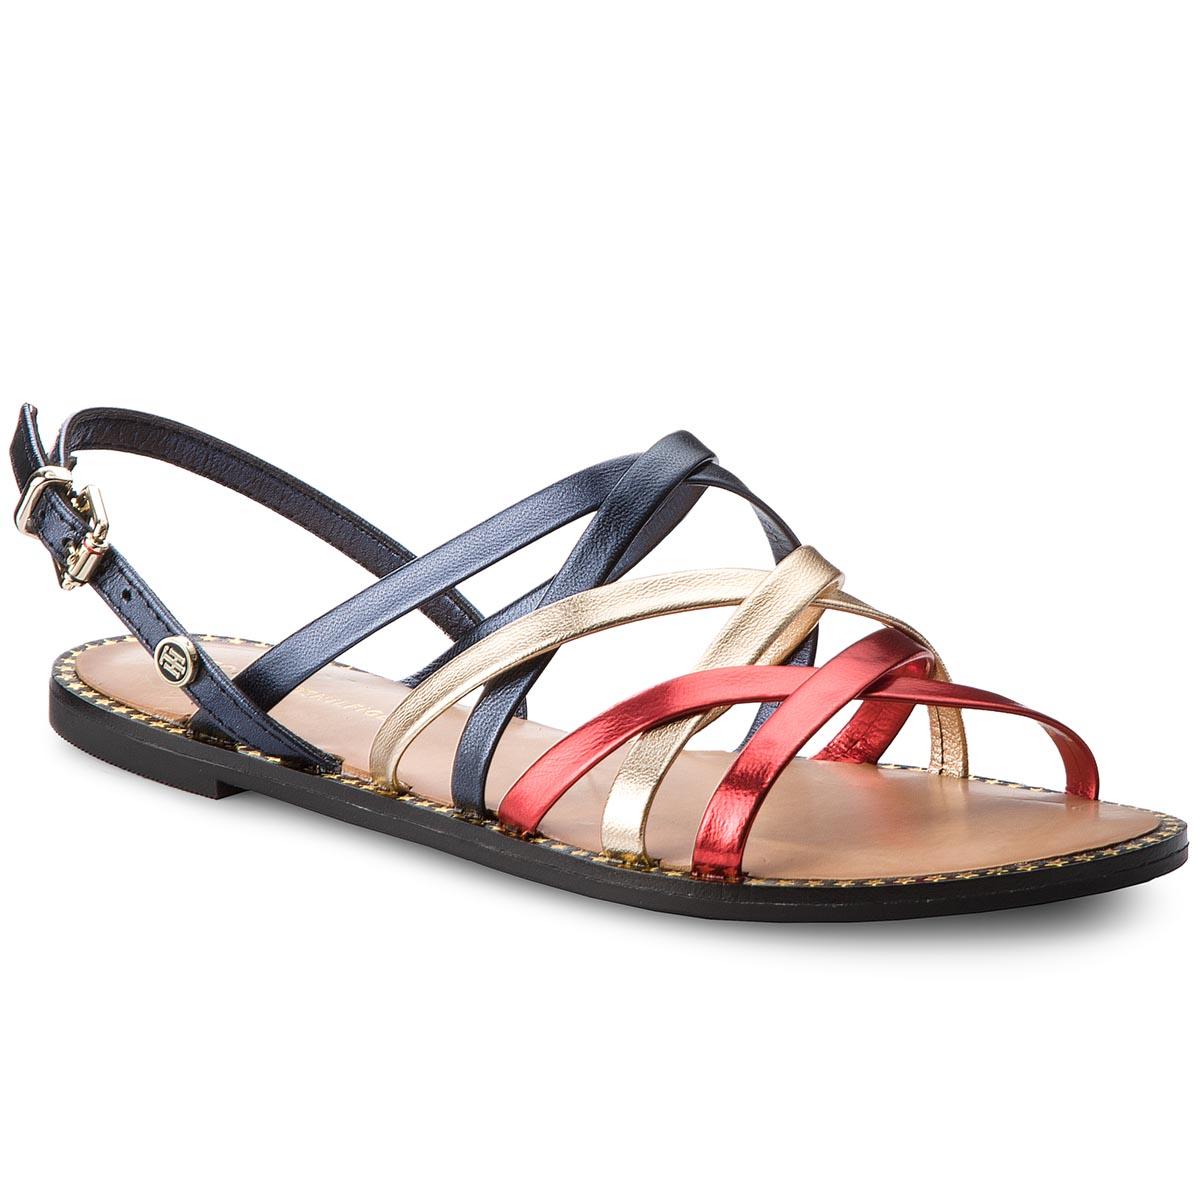 Sandále TOMMY HILFIGER - Metallic Strappy Flat Sandal FW0FW02776 Rwb 020